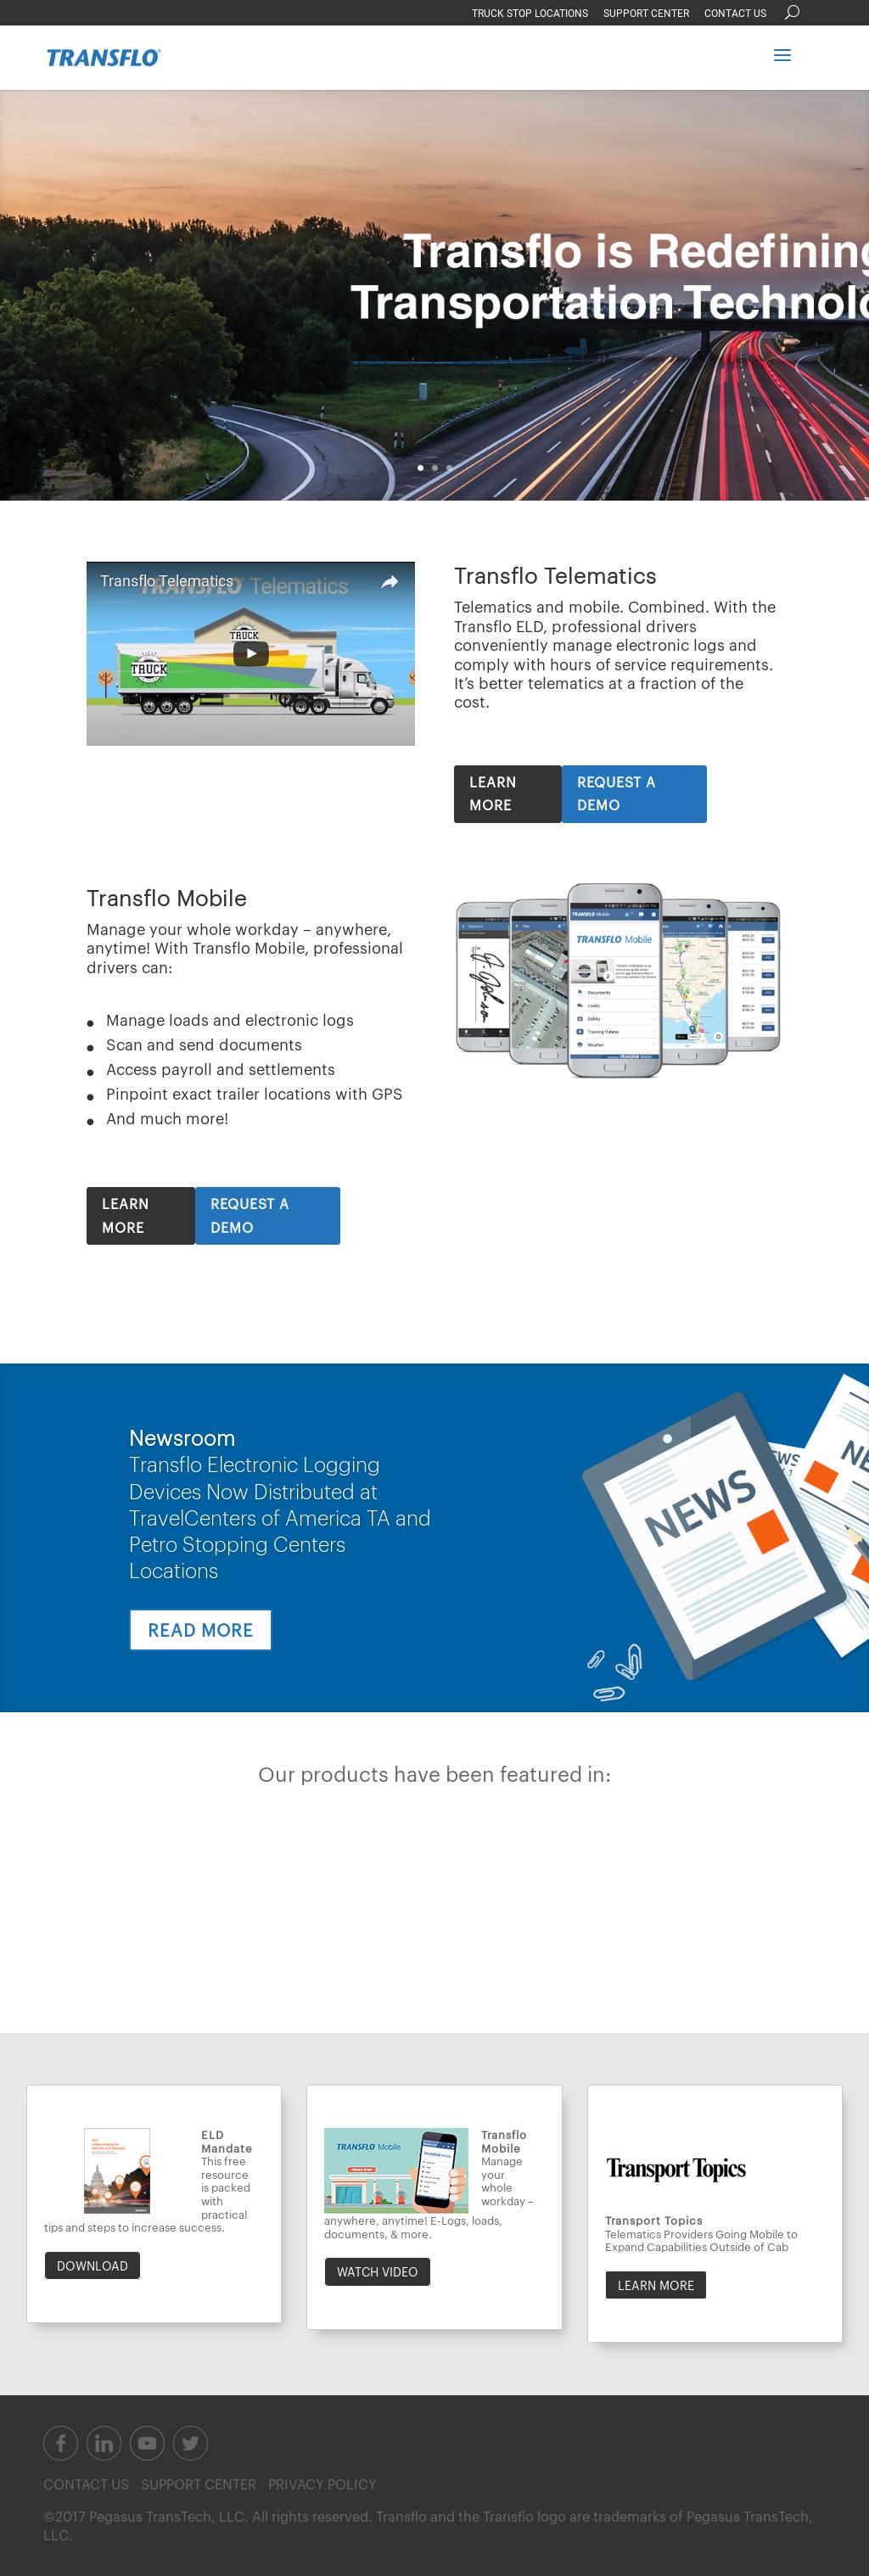 Transflo Competitors, Revenue and Employees - Owler Company